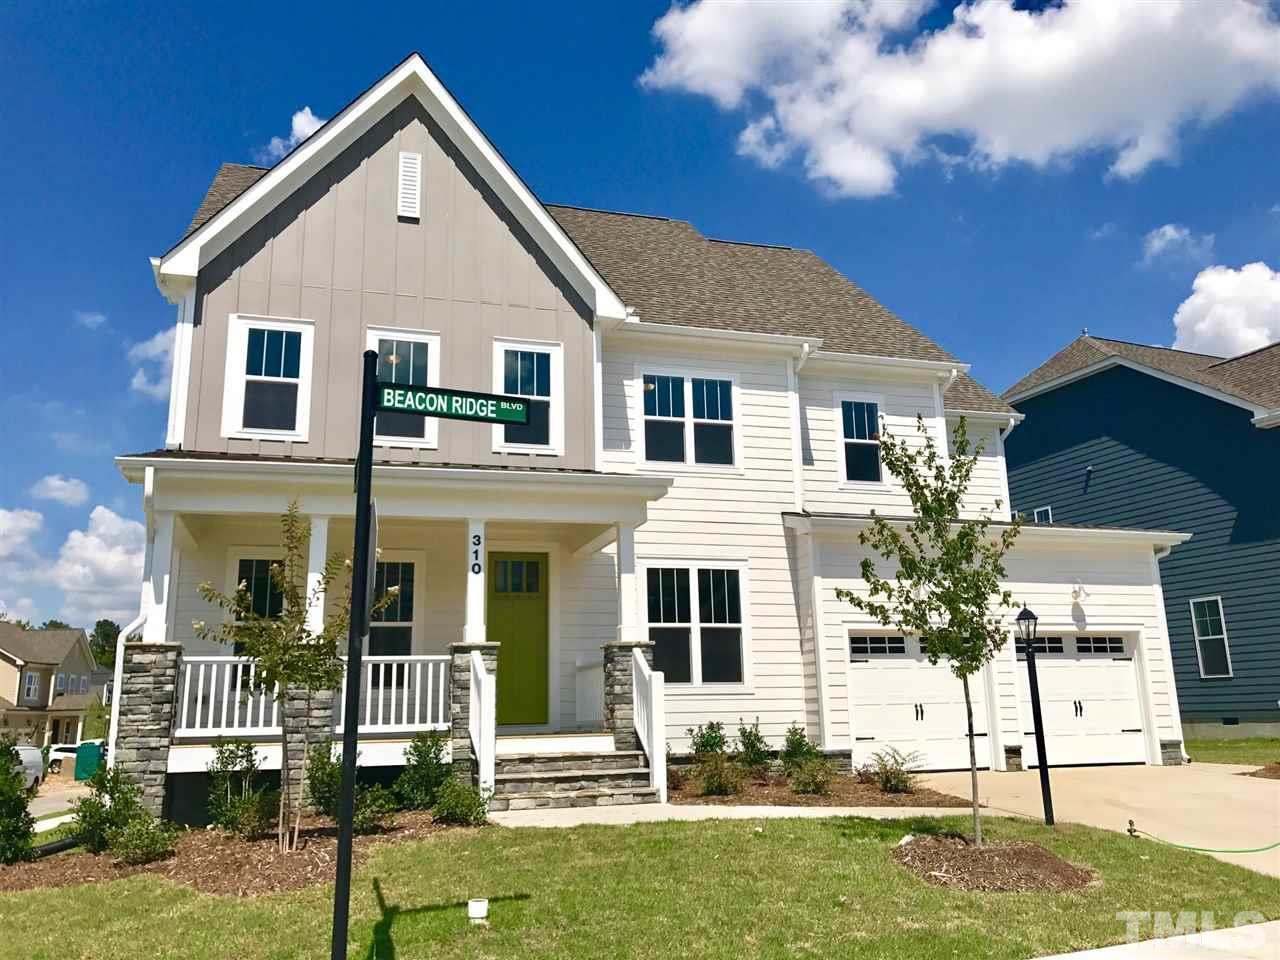 310 Beacon Ridge Blvd, Chapel Hill, NC